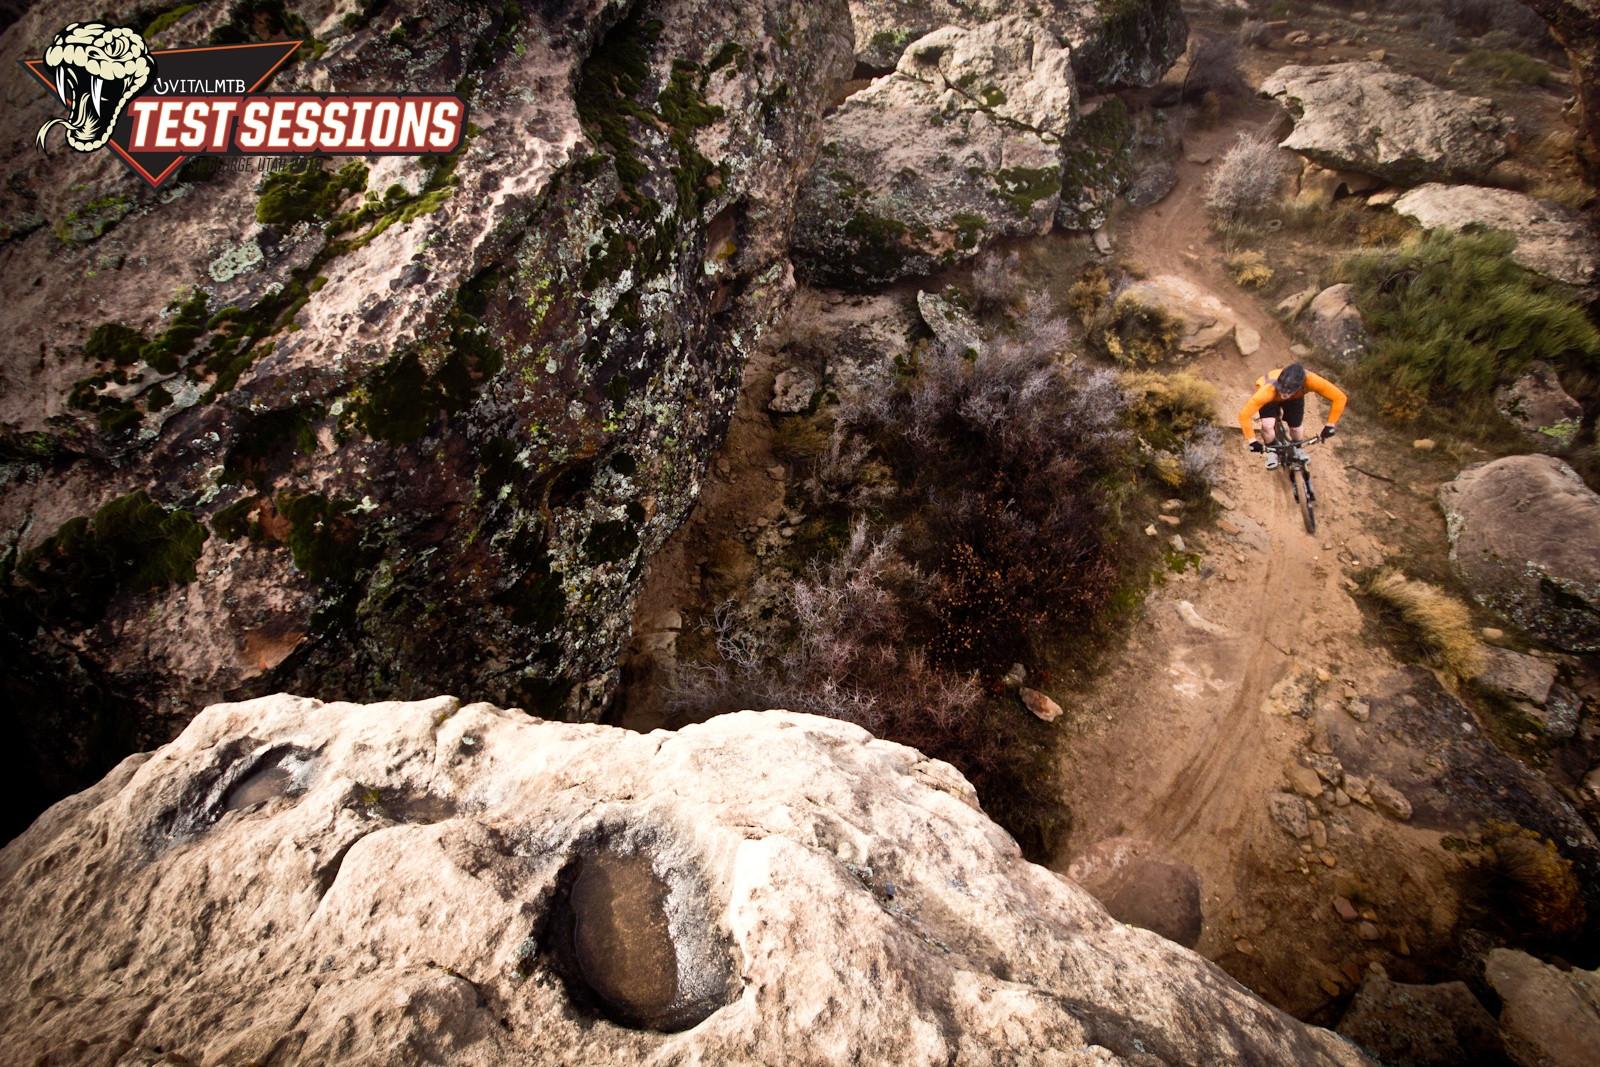 Ibis Mojo SL-R from Vital MTB Test Sessions - Ibis Mojo SL-R from Vital MTB Test Sessions - Mountain Biking Pictures - Vital MTB